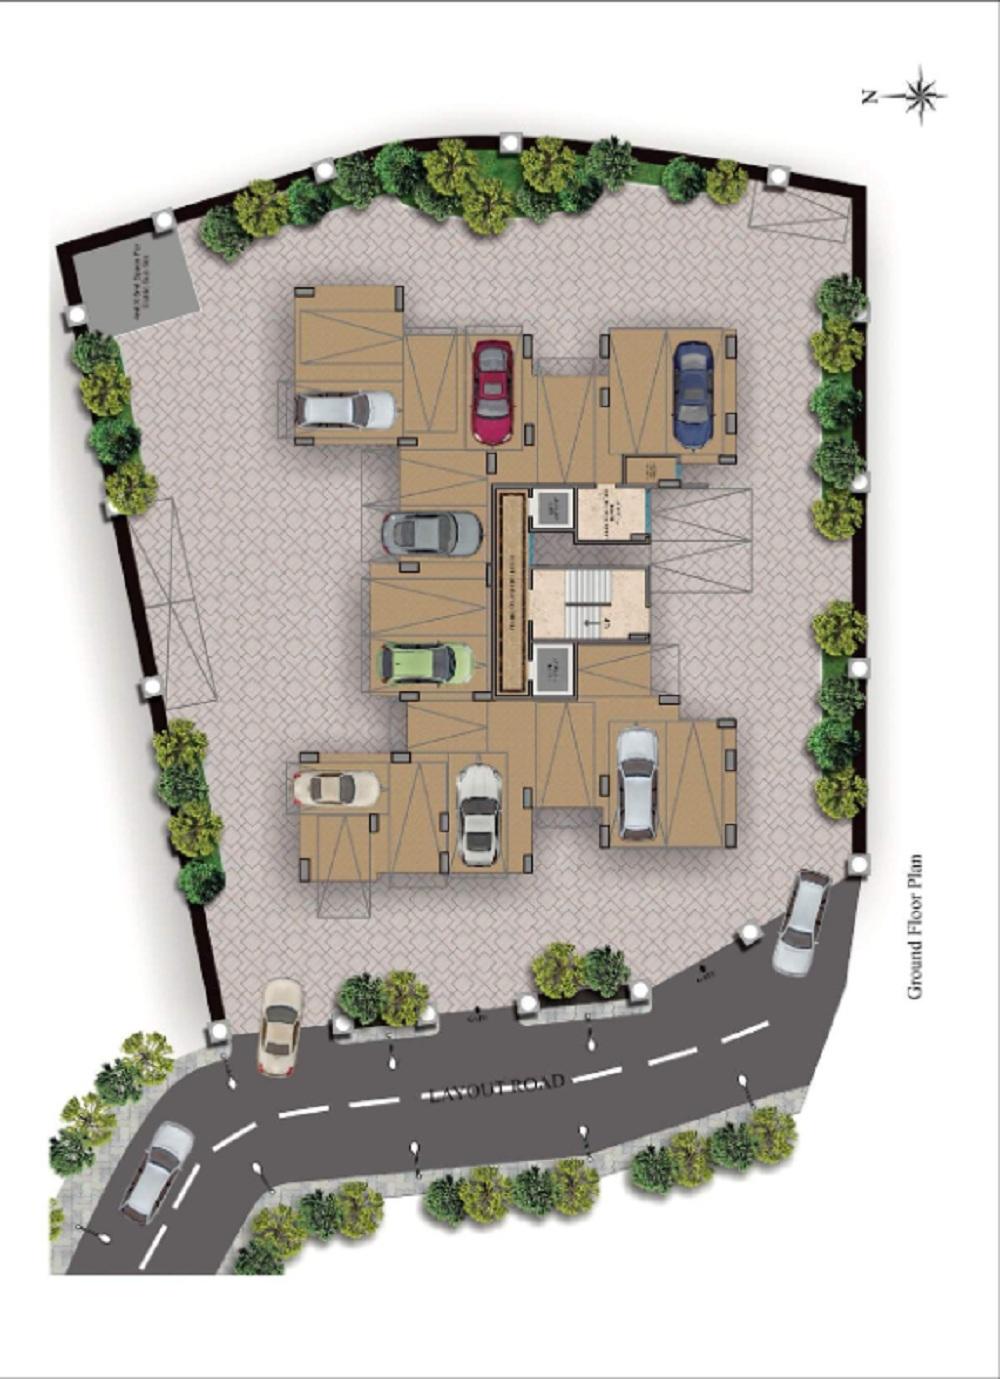 paranjape schemes geetanjali project master plan image1